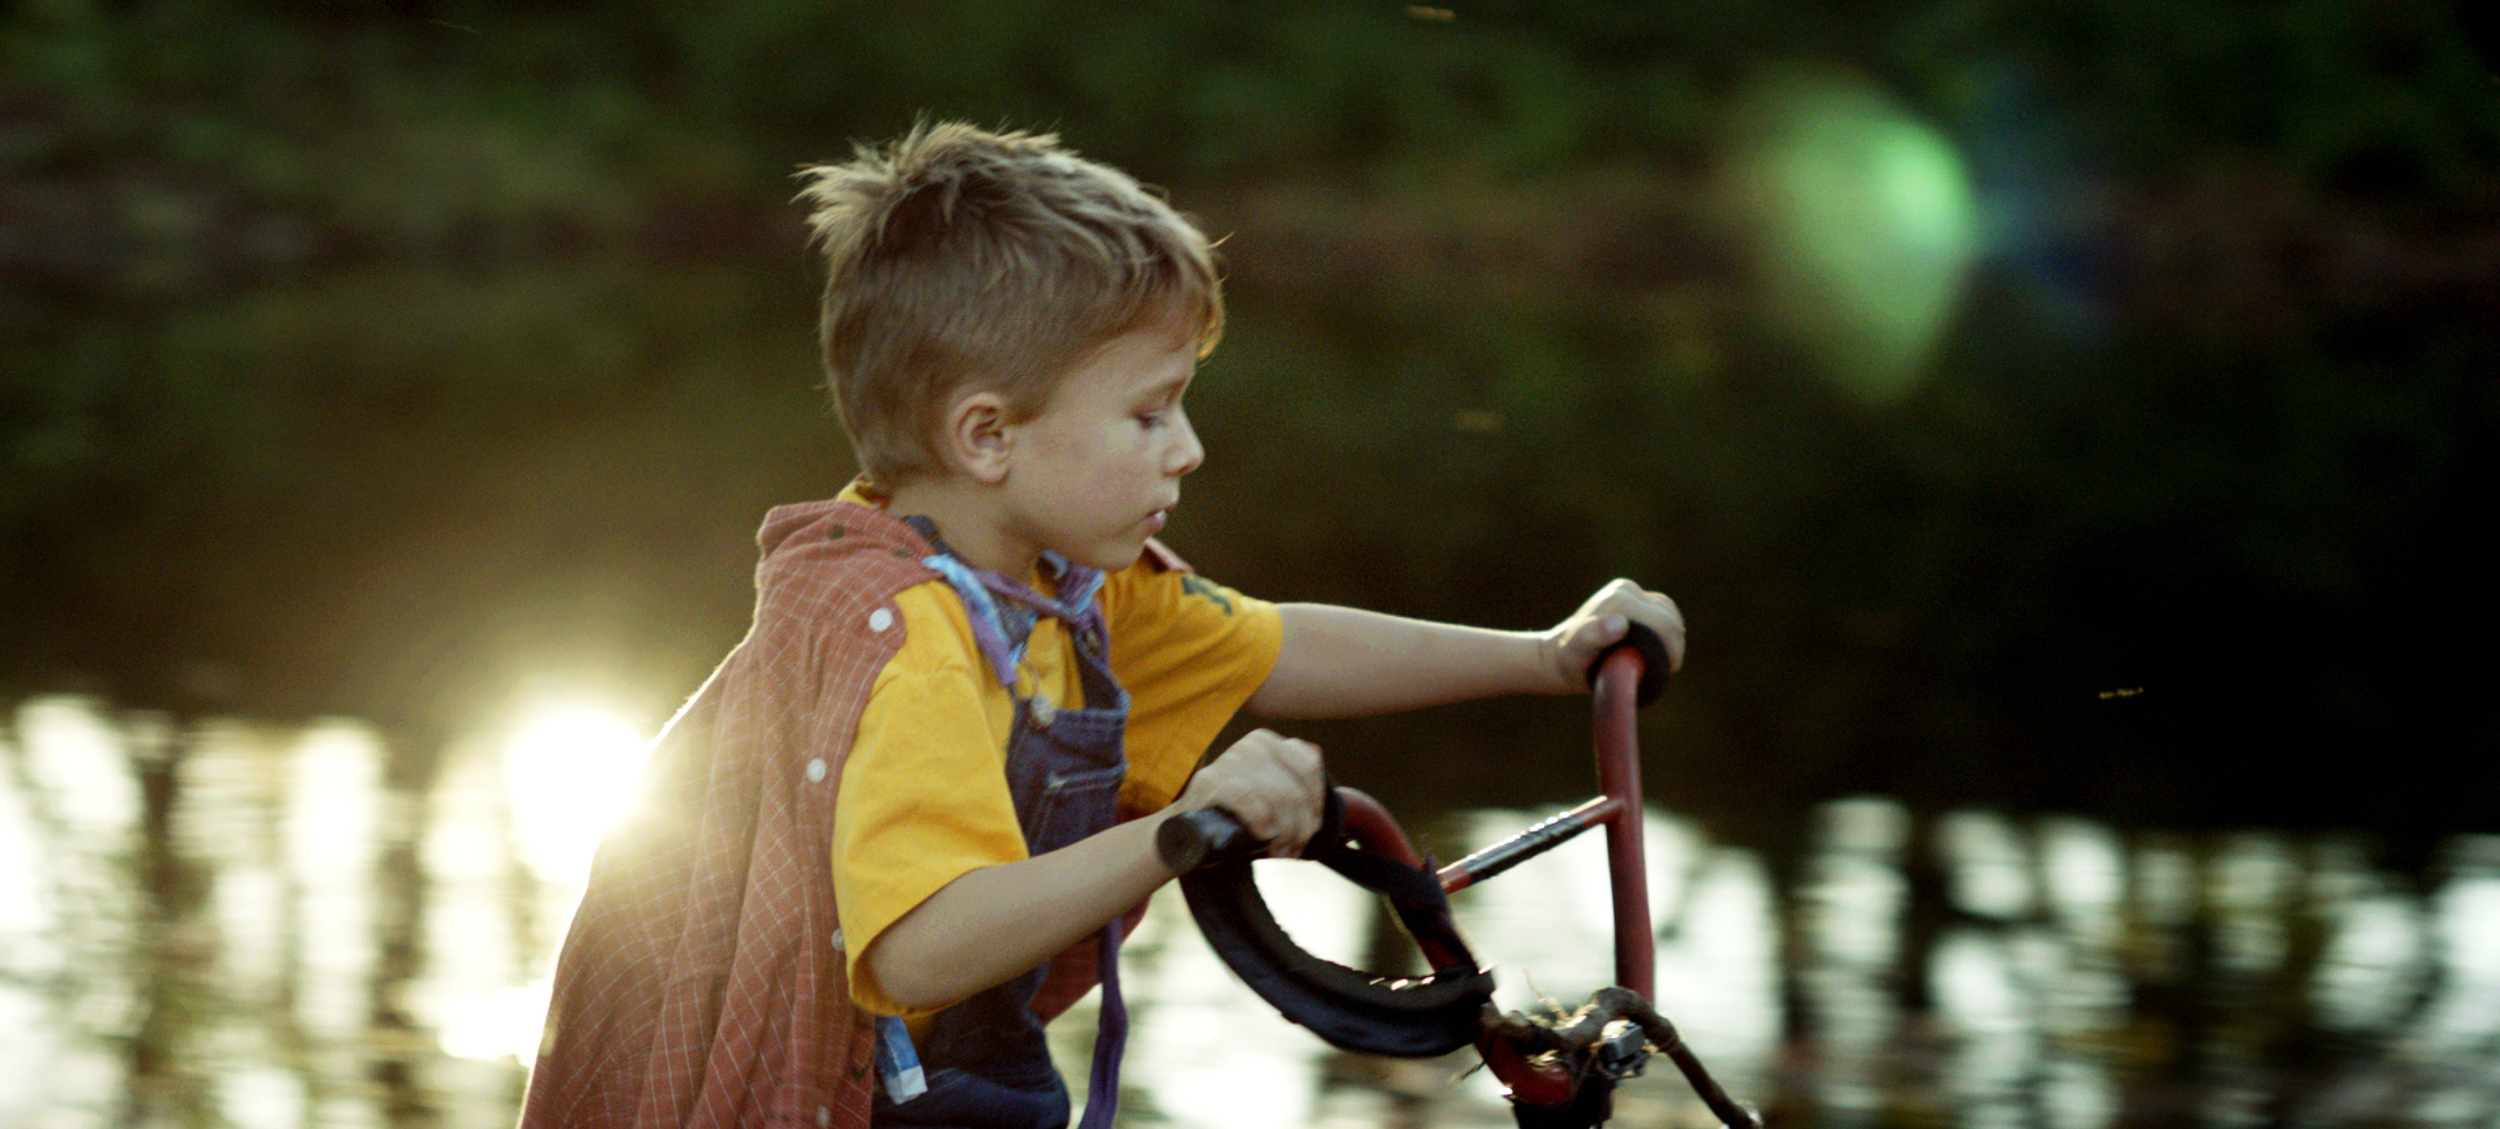 sam bike.jpg